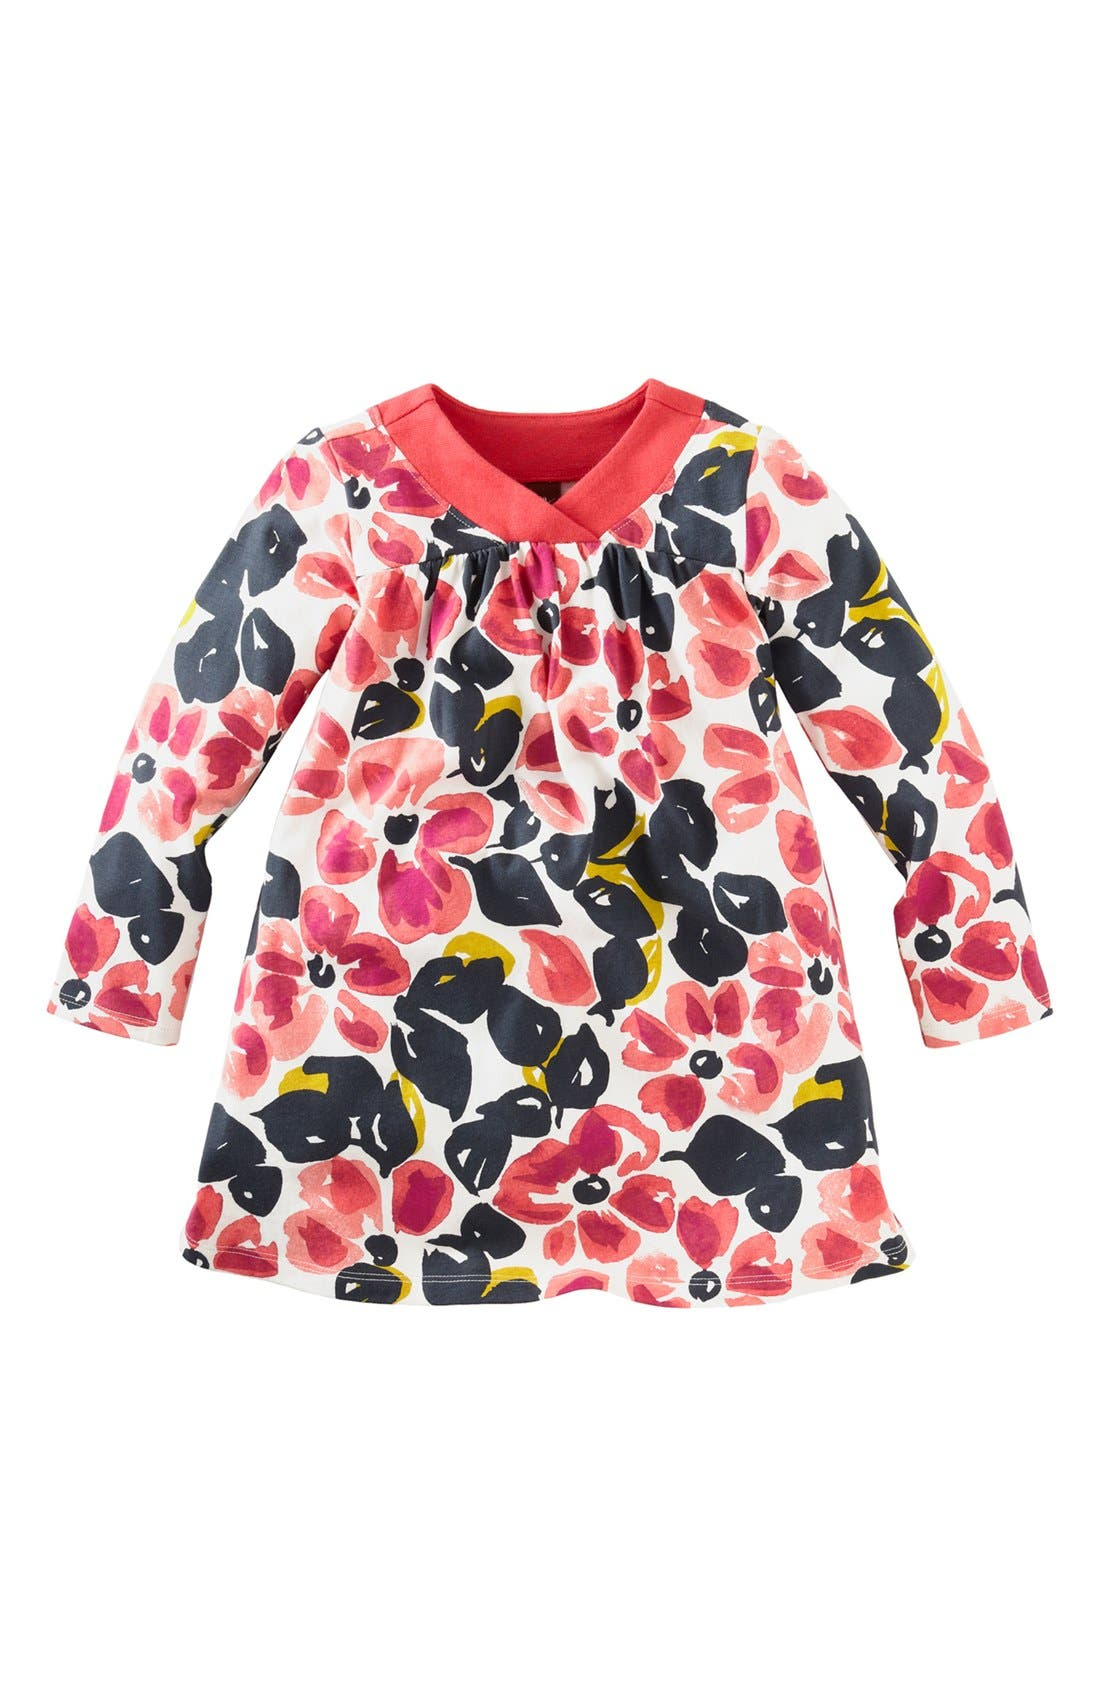 Main Image - Tea Collection 'Water Blossom' Dress (Little Girls & Big Girls)